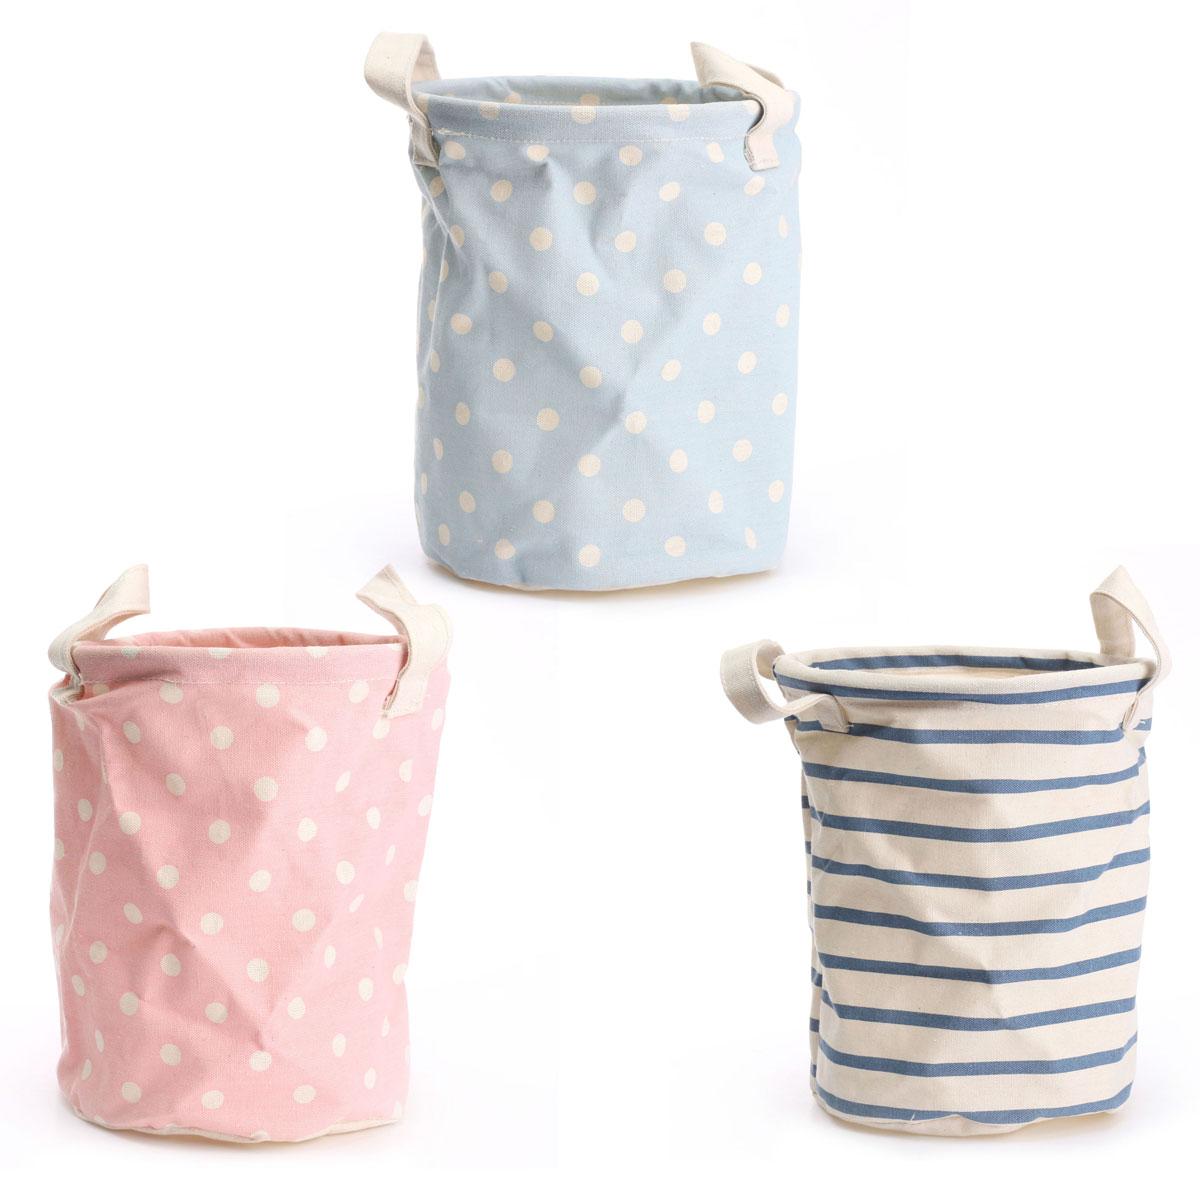 Jbs Keranjang Baju Kotor Lipat Motif Karakter Laundry Basket Multi Bag Good Quality Hamper Basketidr38250 Rp 38250